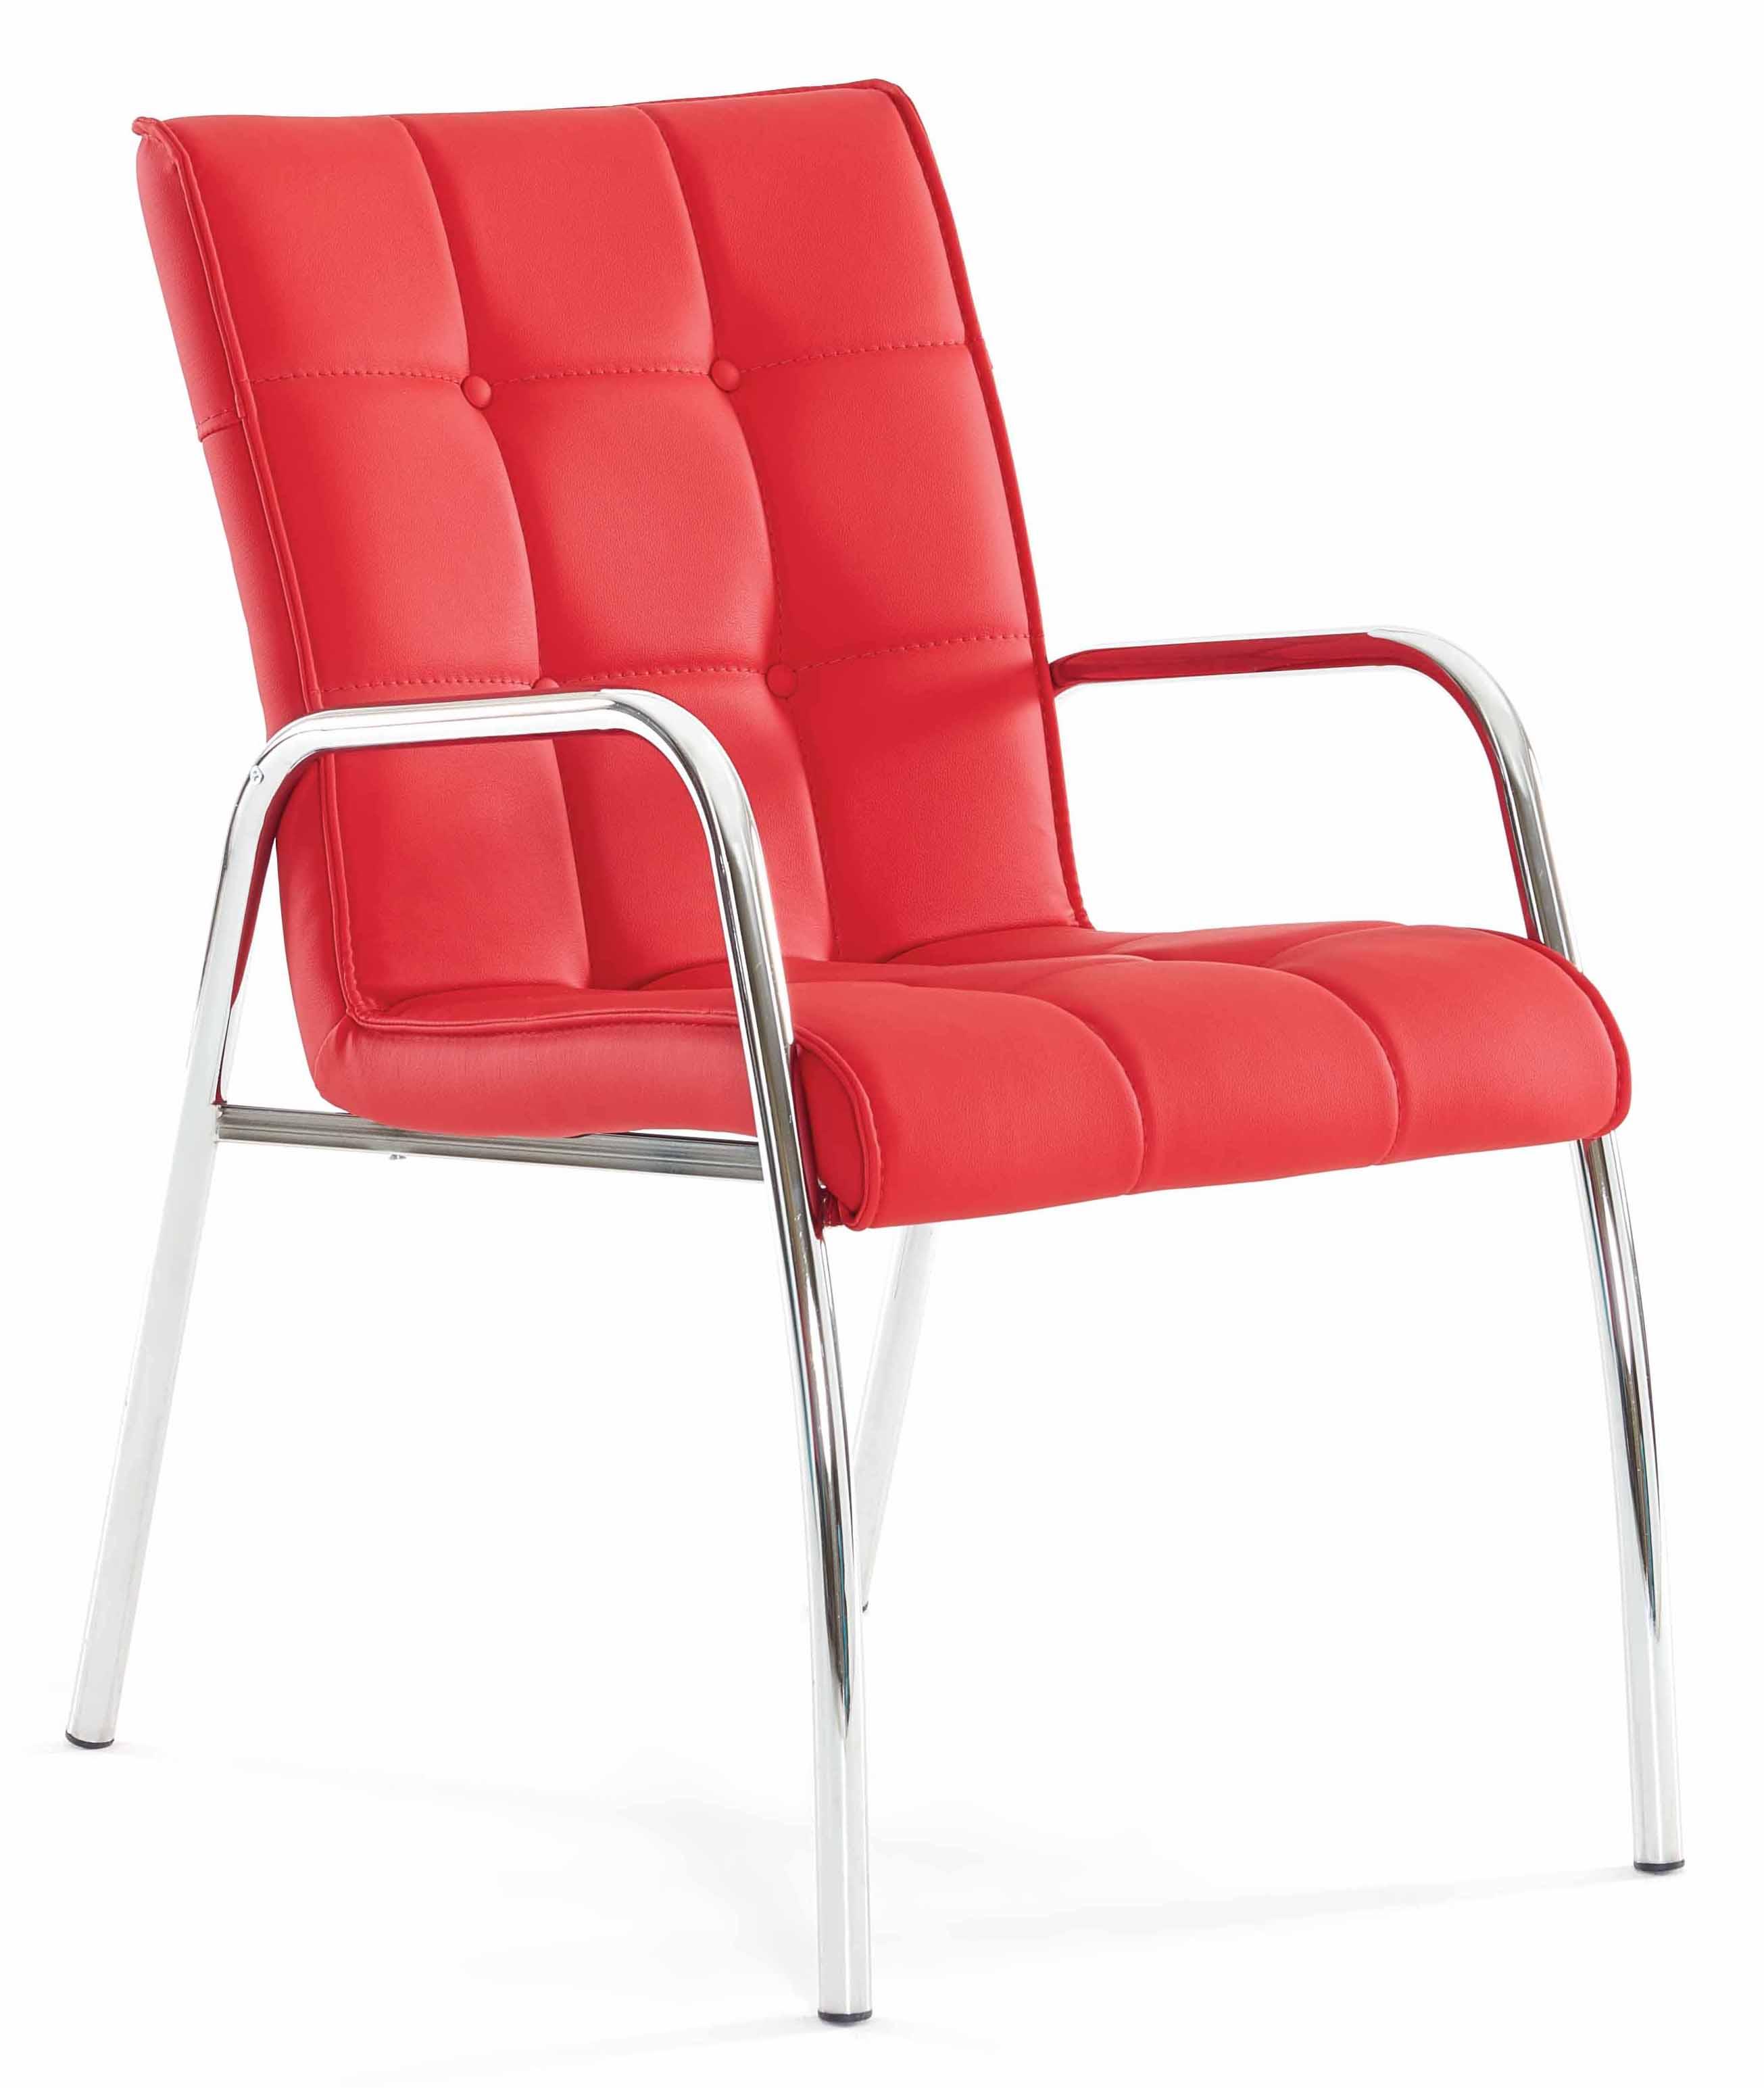 Bürosessel Konferenzstuhl Rot Mit Metallfuß Armlehne Günstig